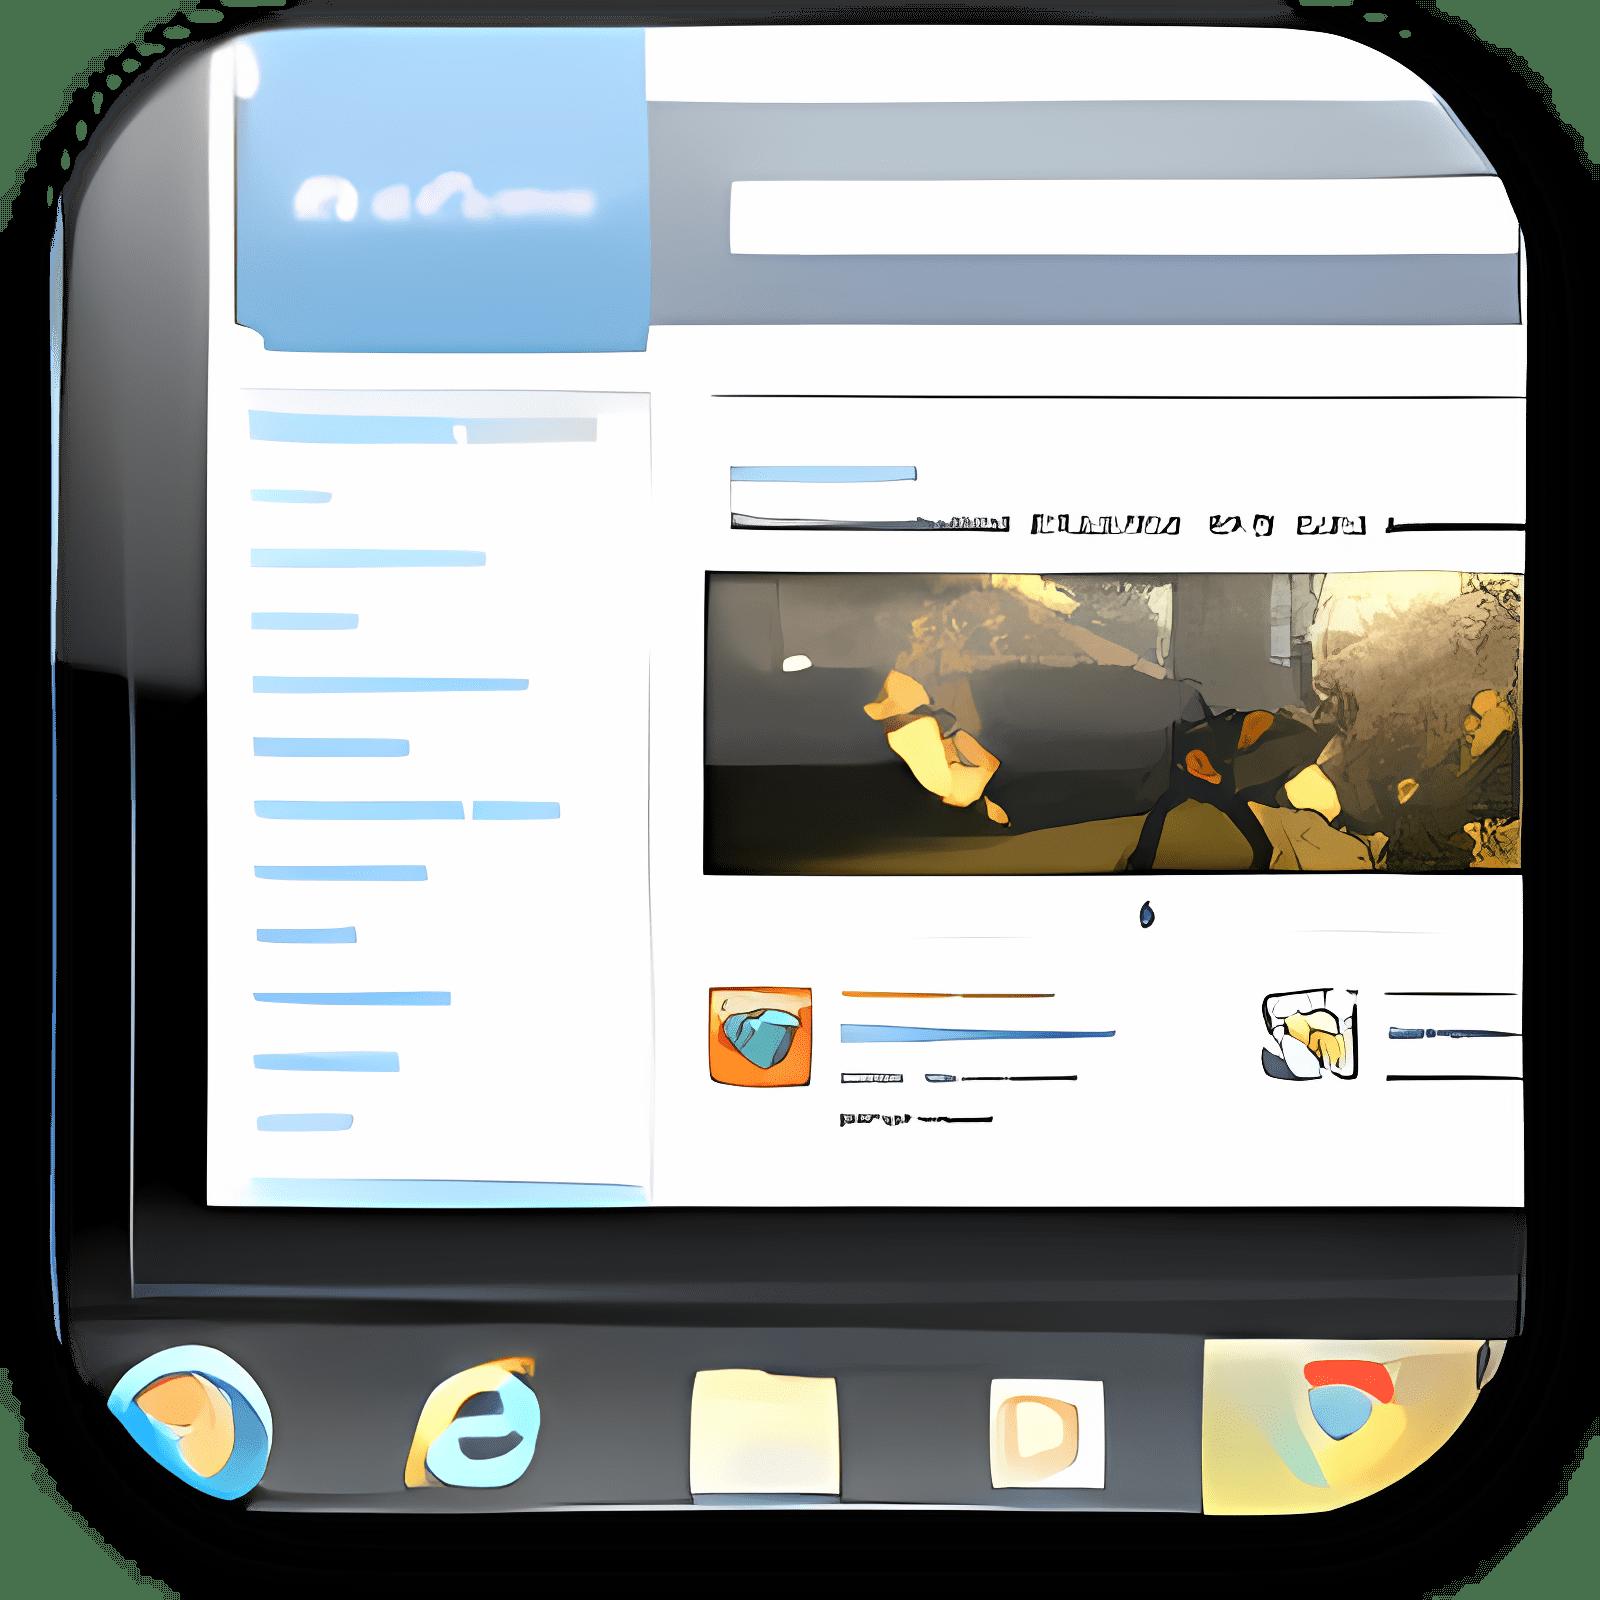 Windows 7 Taskbar Big Preview